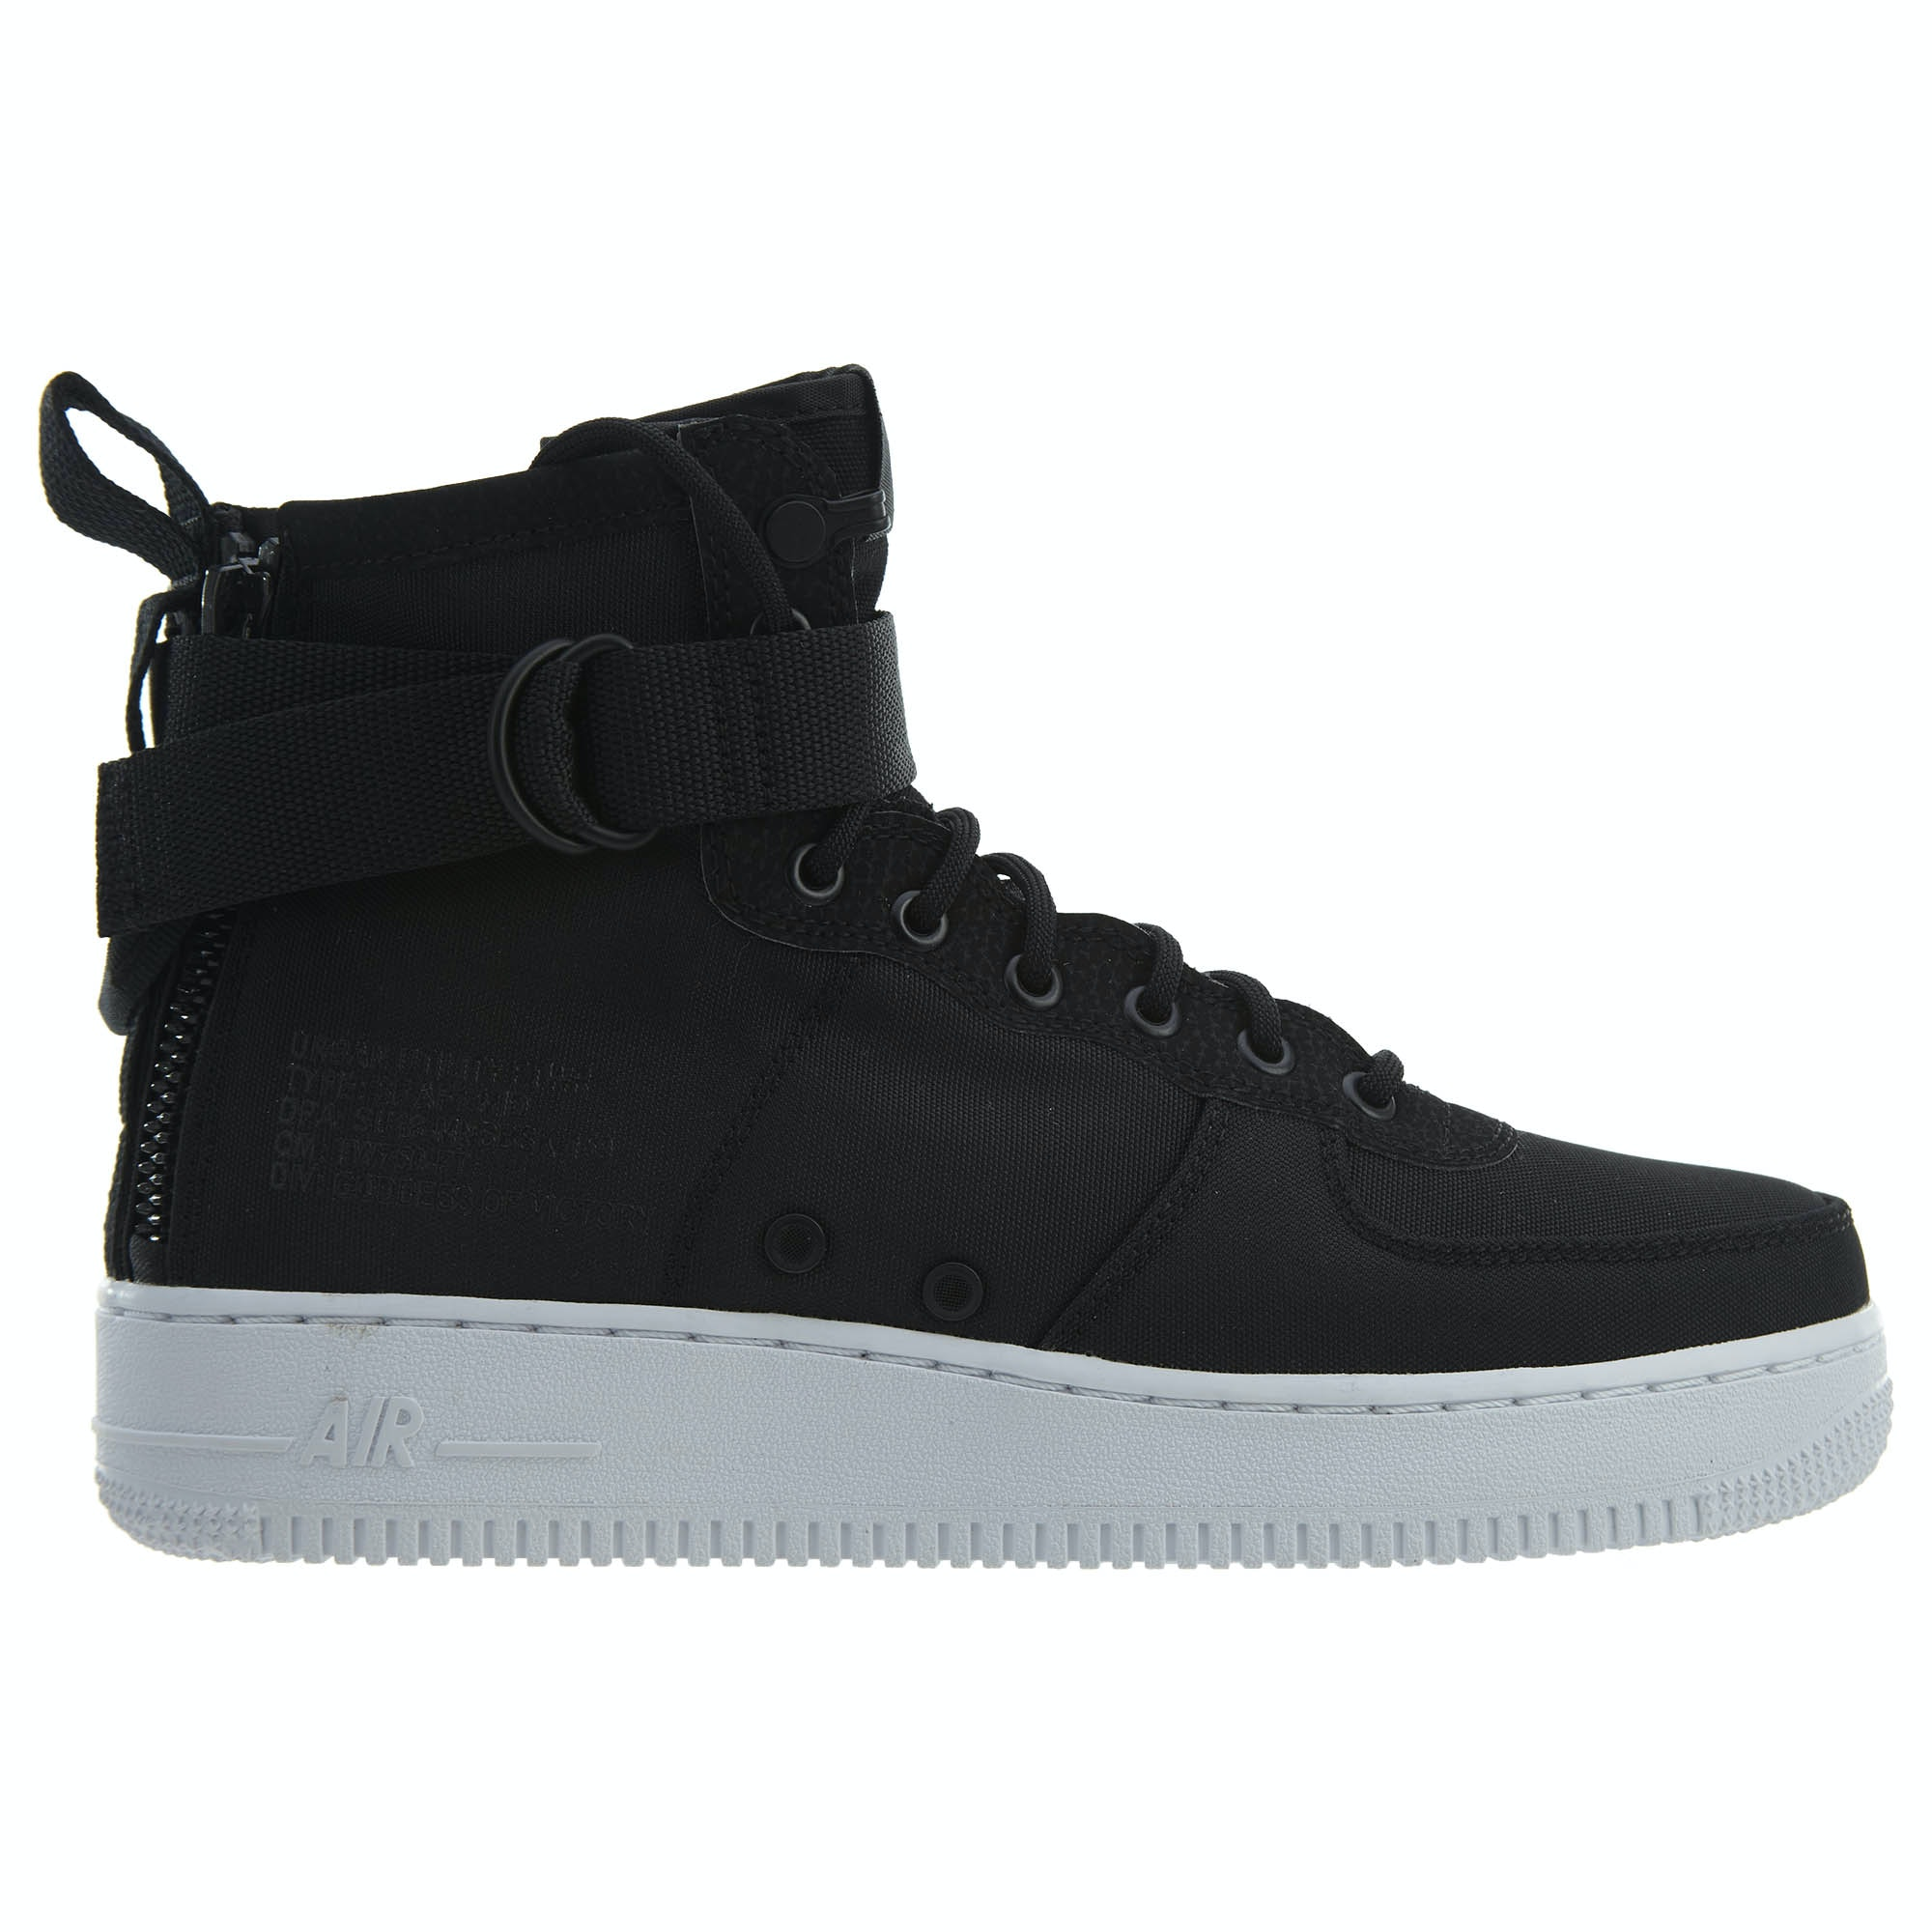 Nike Sf Af1 Mid Black Anthracite-White